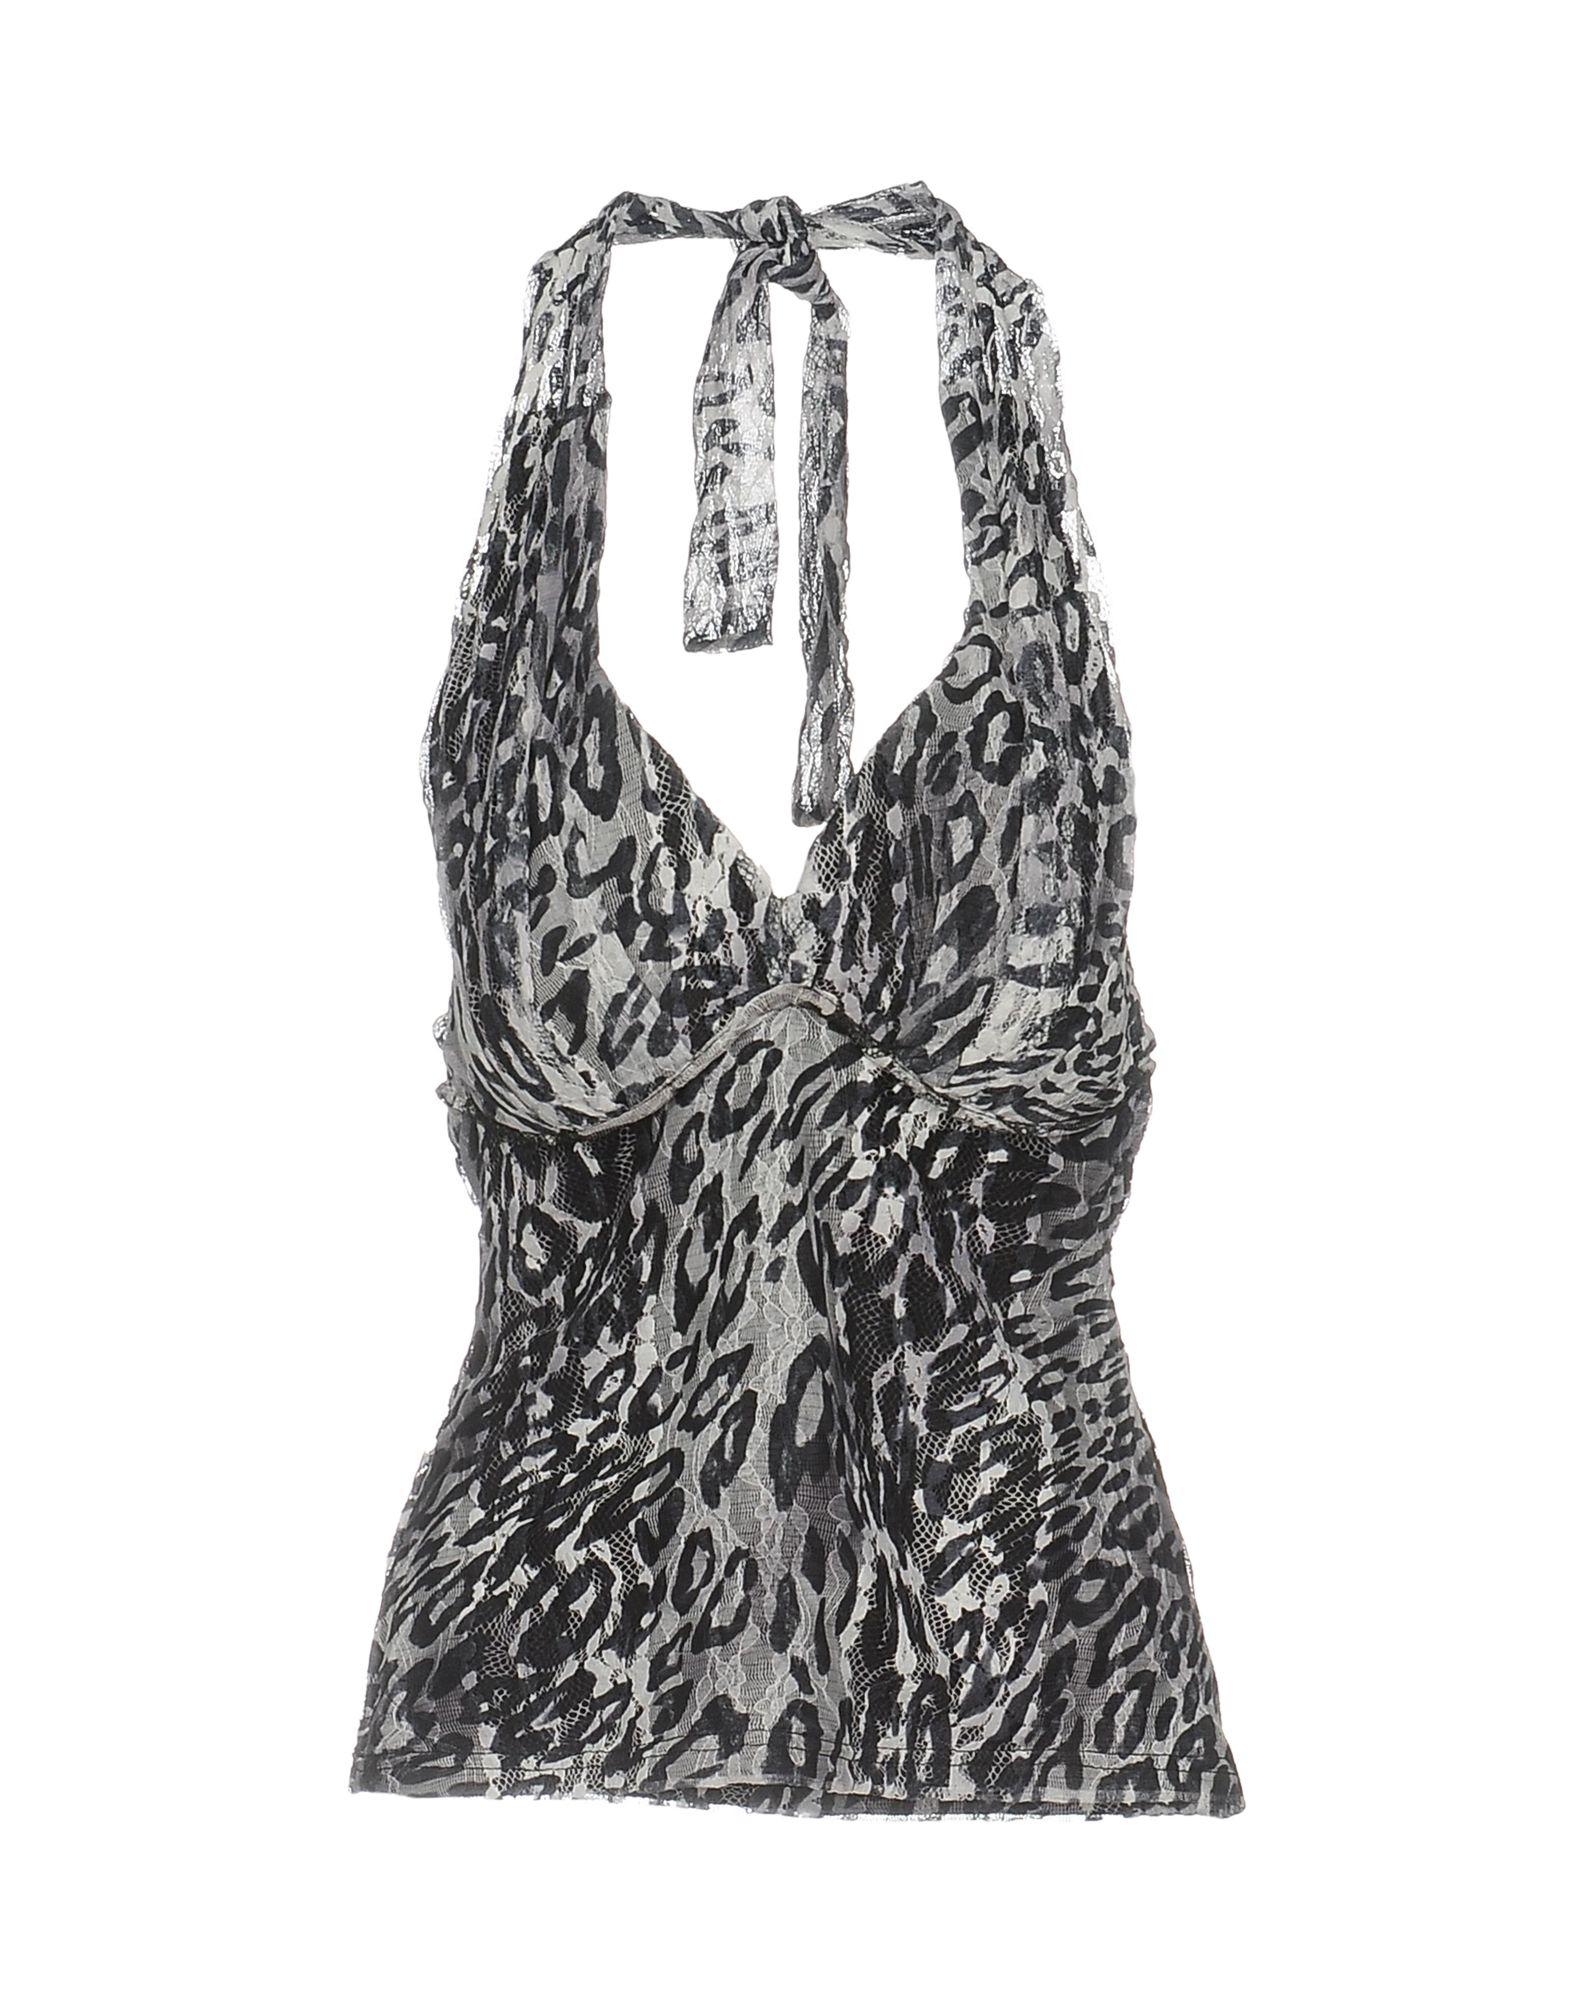 BLANC NATURE Топ без рукавов poivre blanc брюки мембранные w16 0922 jrby на лямках черный